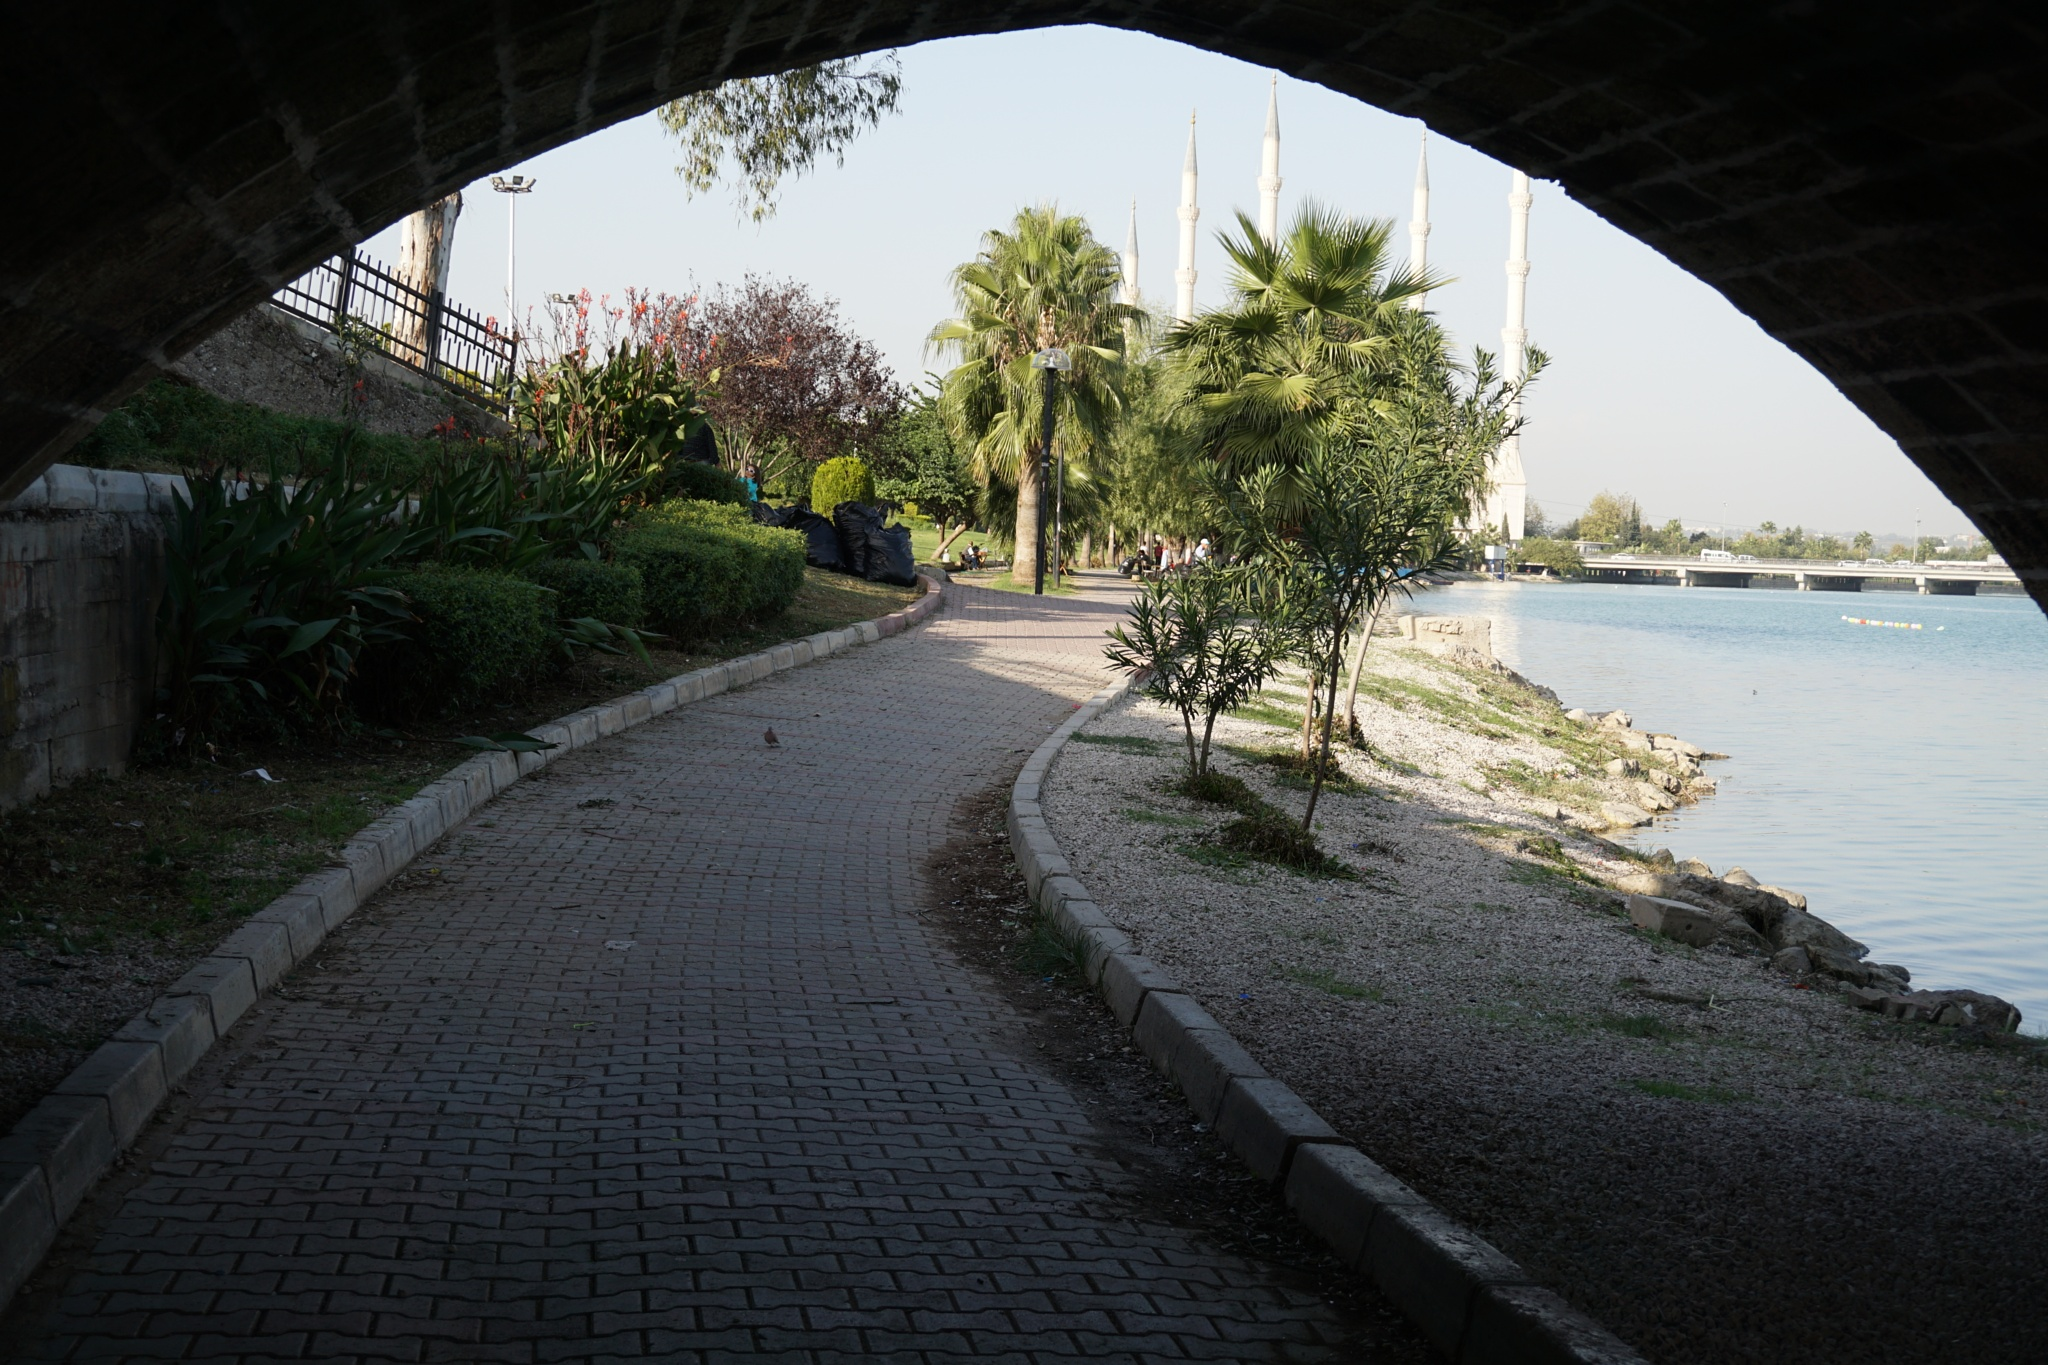 taşköprü by zehracavili